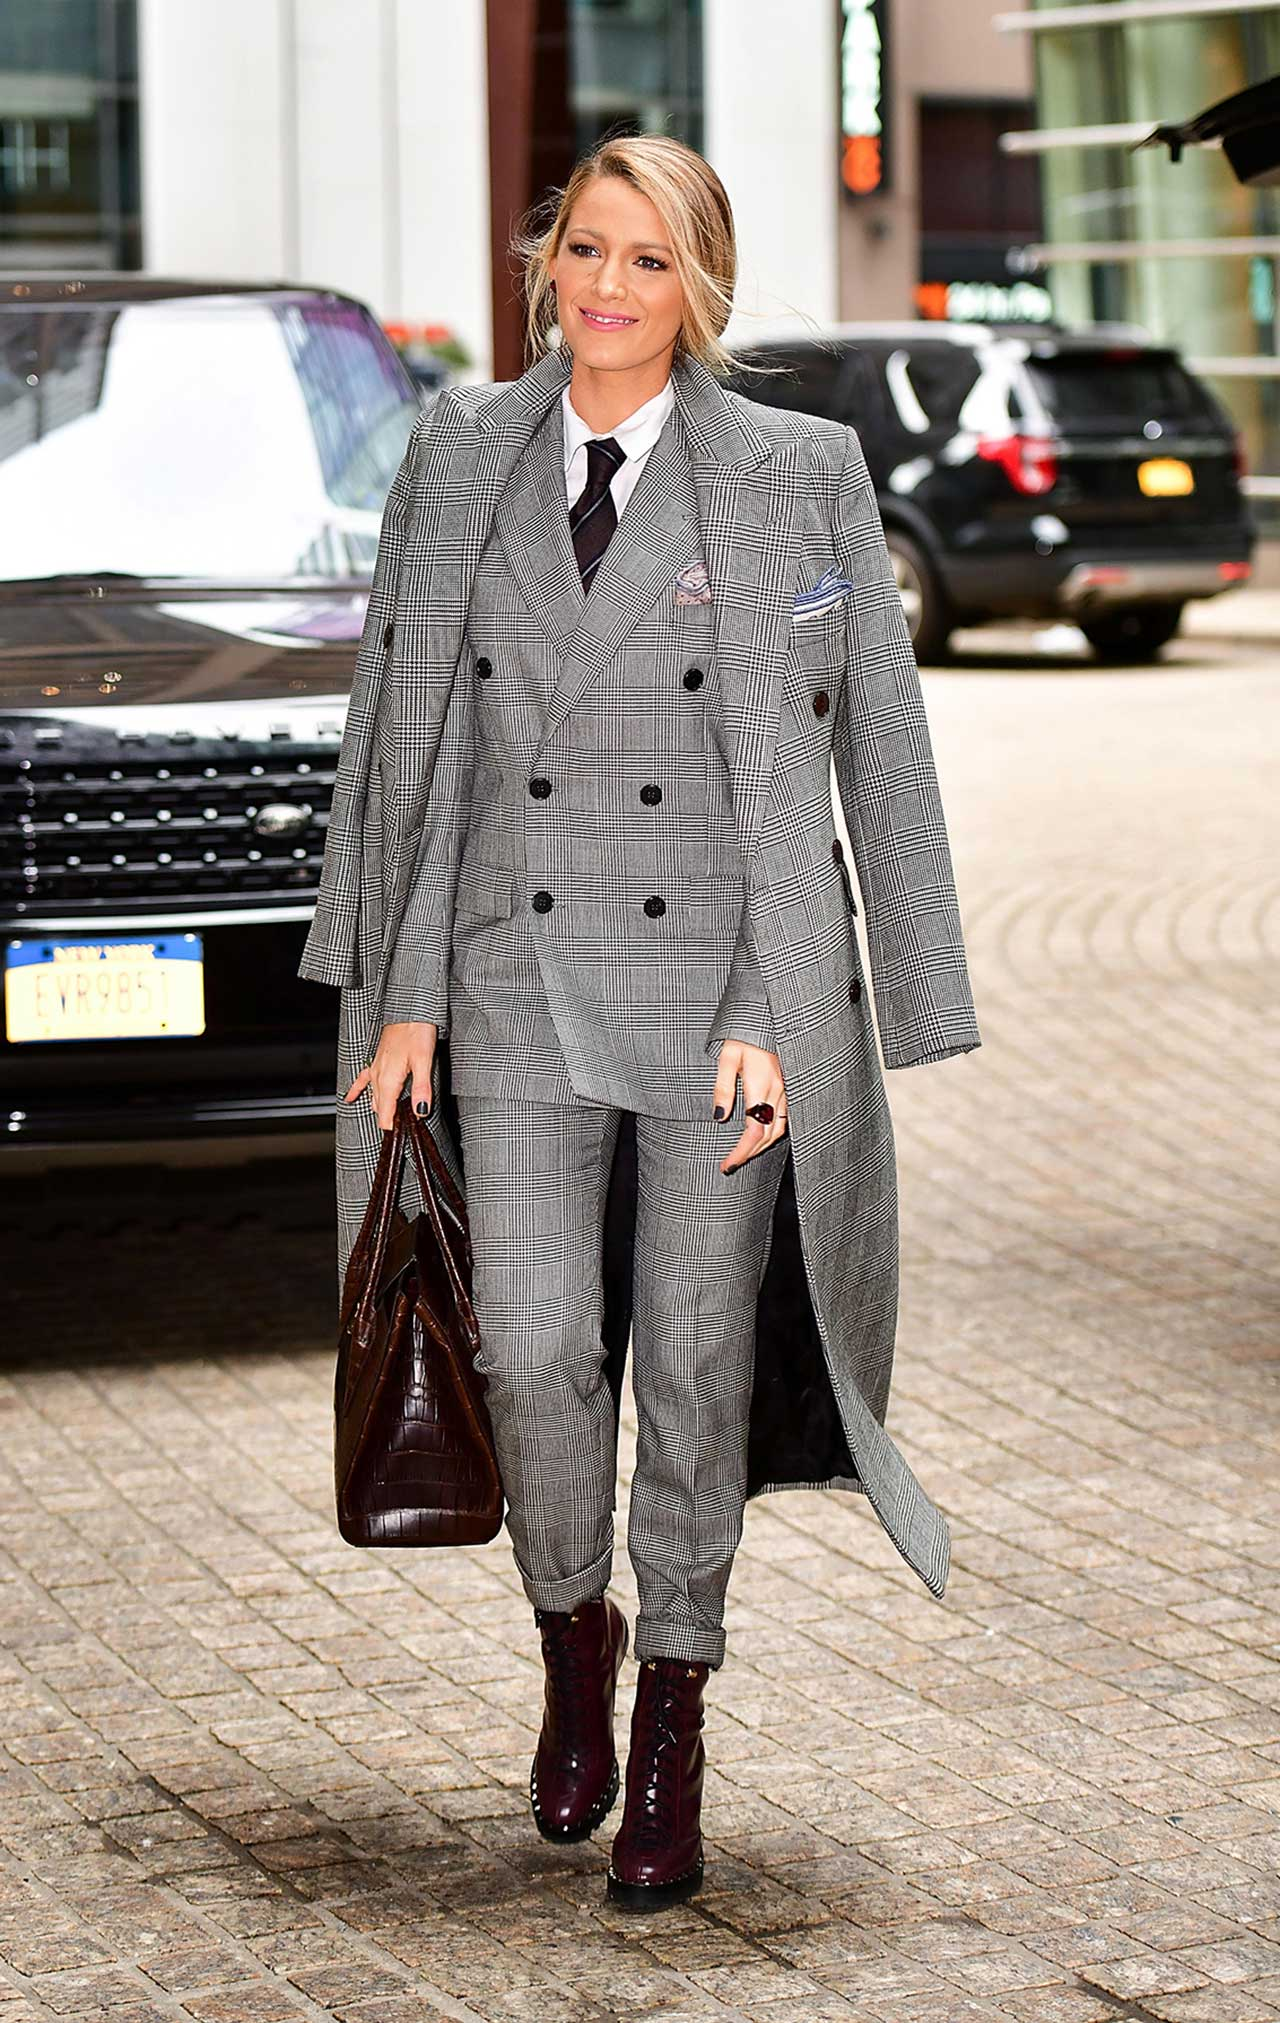 http://top6trends.com/wp-content/uploads/2017/10/blake-lively-style-ralph-lauren-collection-glen-plaid-coat-blazer-pants.jpg